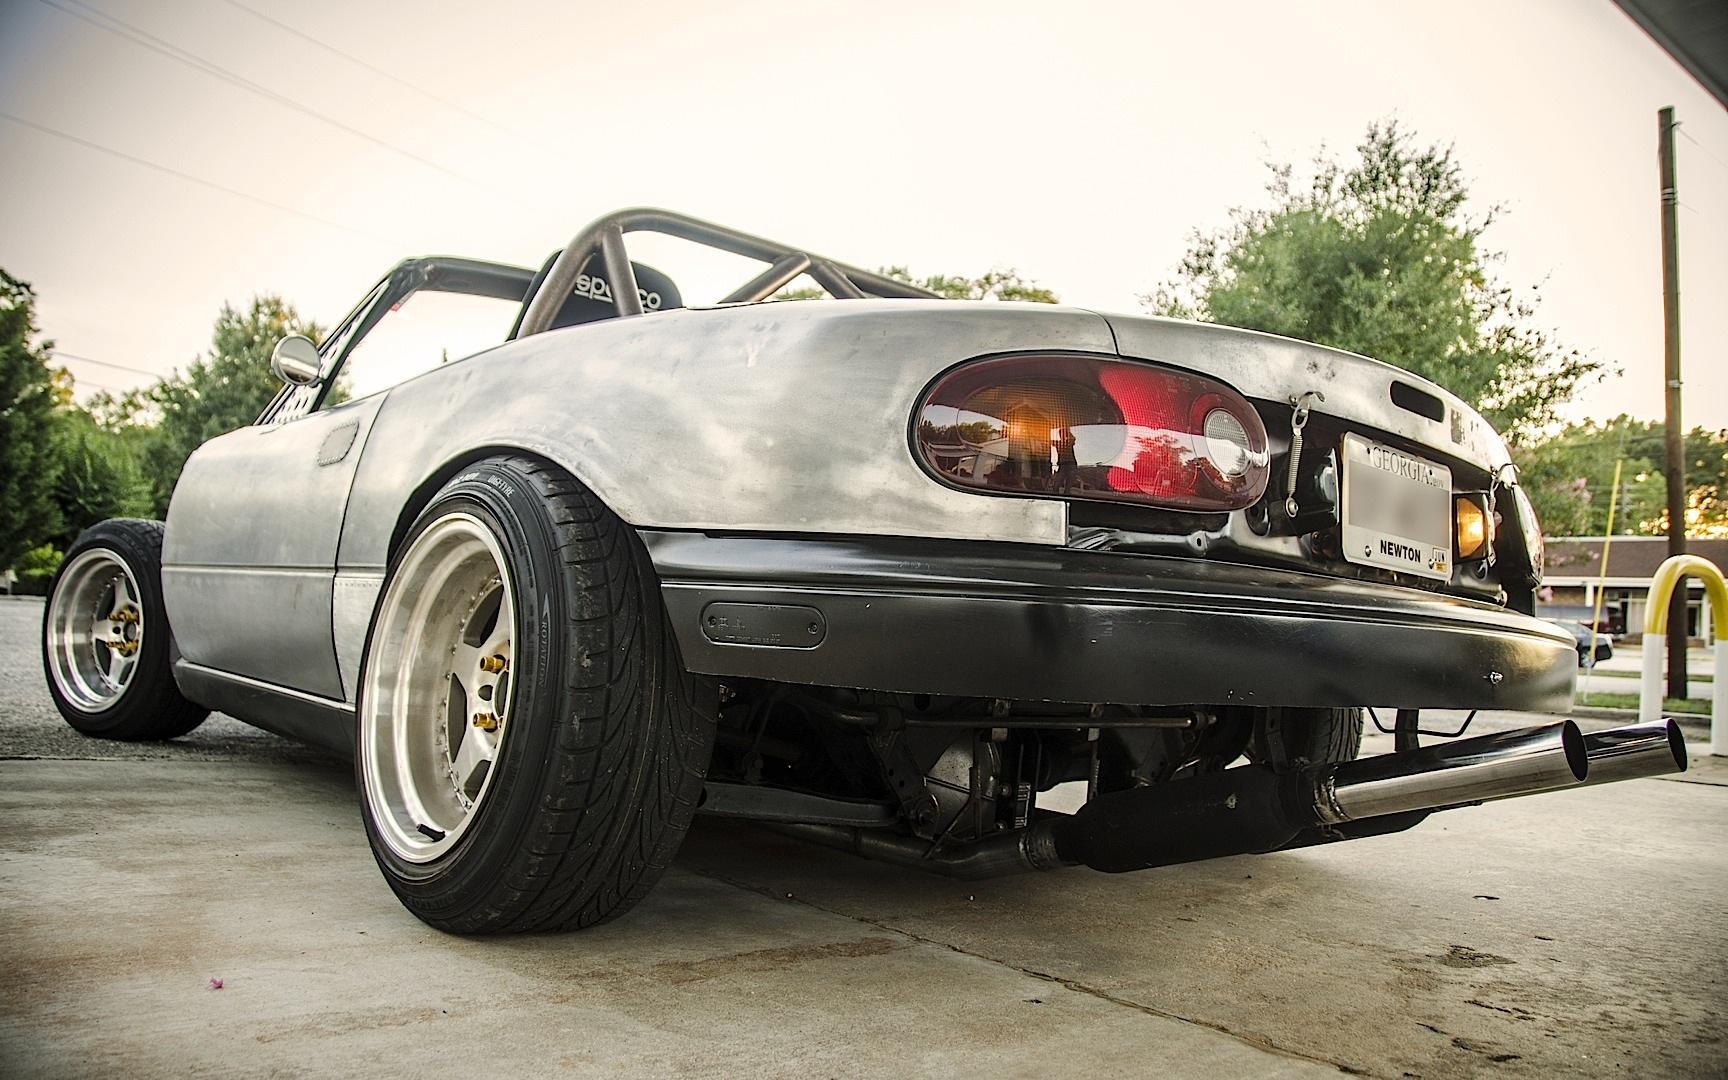 Mazda Miata (MX-5) Rat Rod powered by 302 V8 engine (more pics in